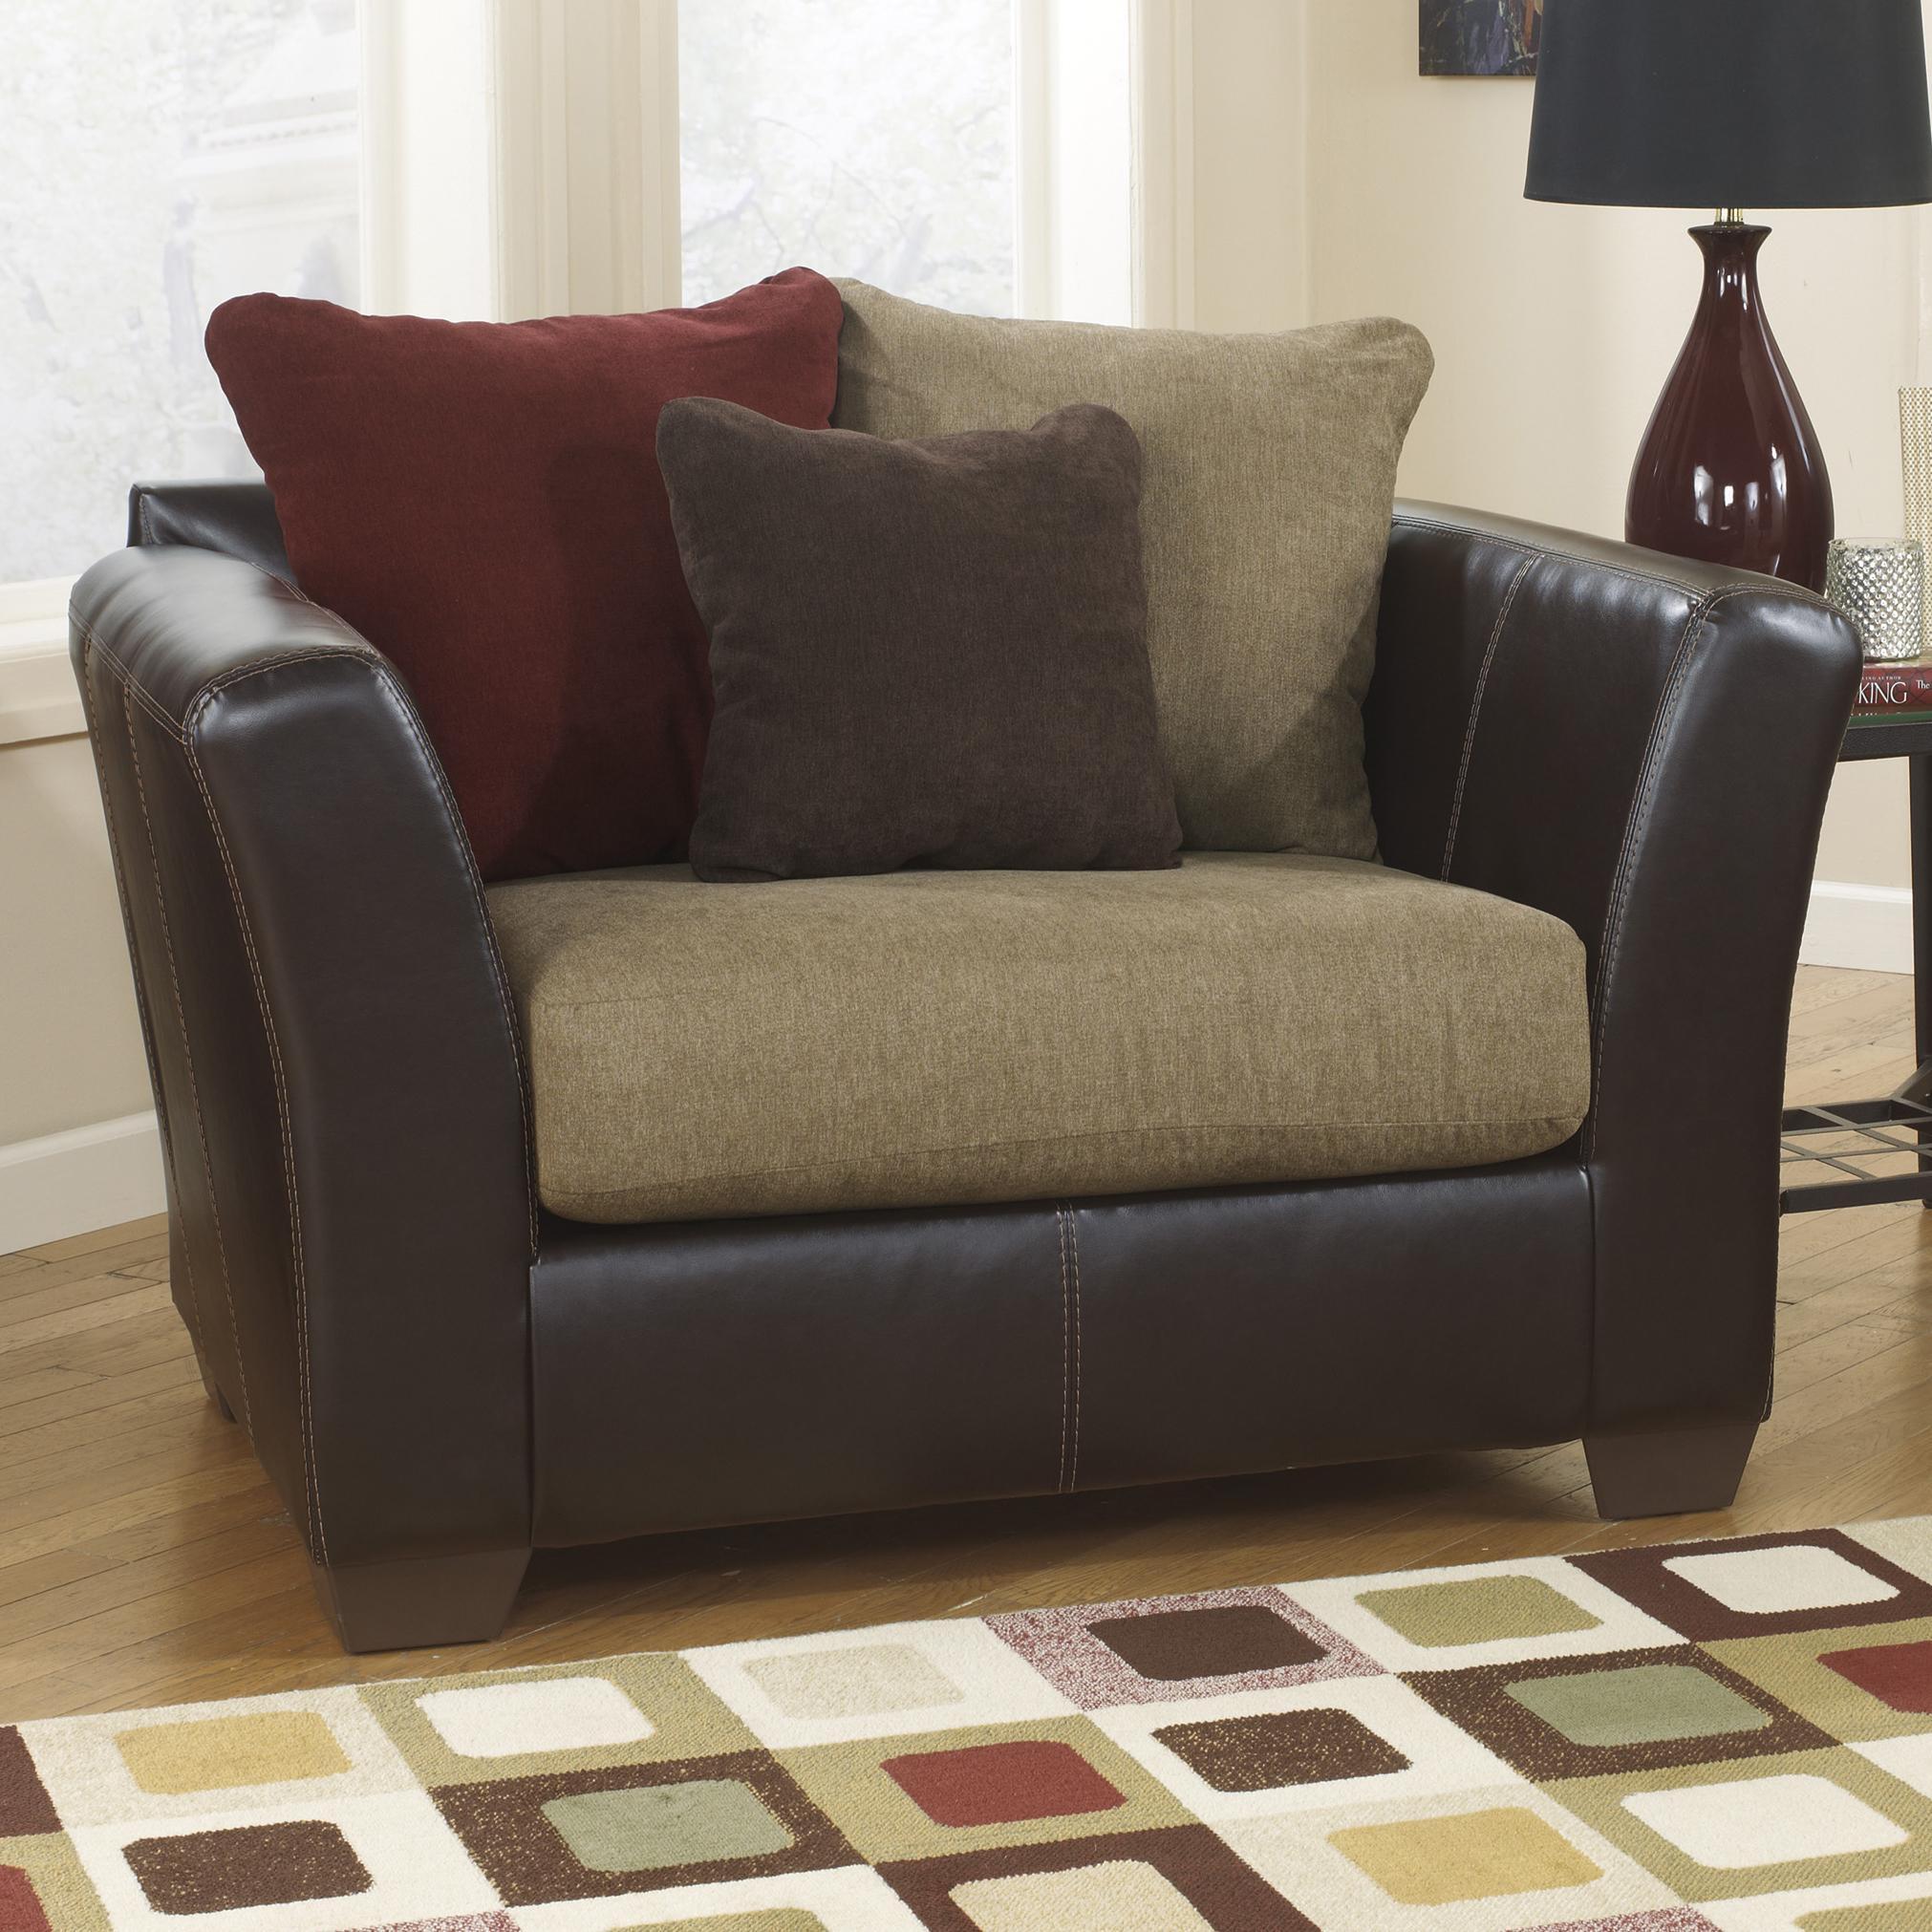 Ashley Furniture Sanya - Mocha Chair and a Half - Item Number: 2840023